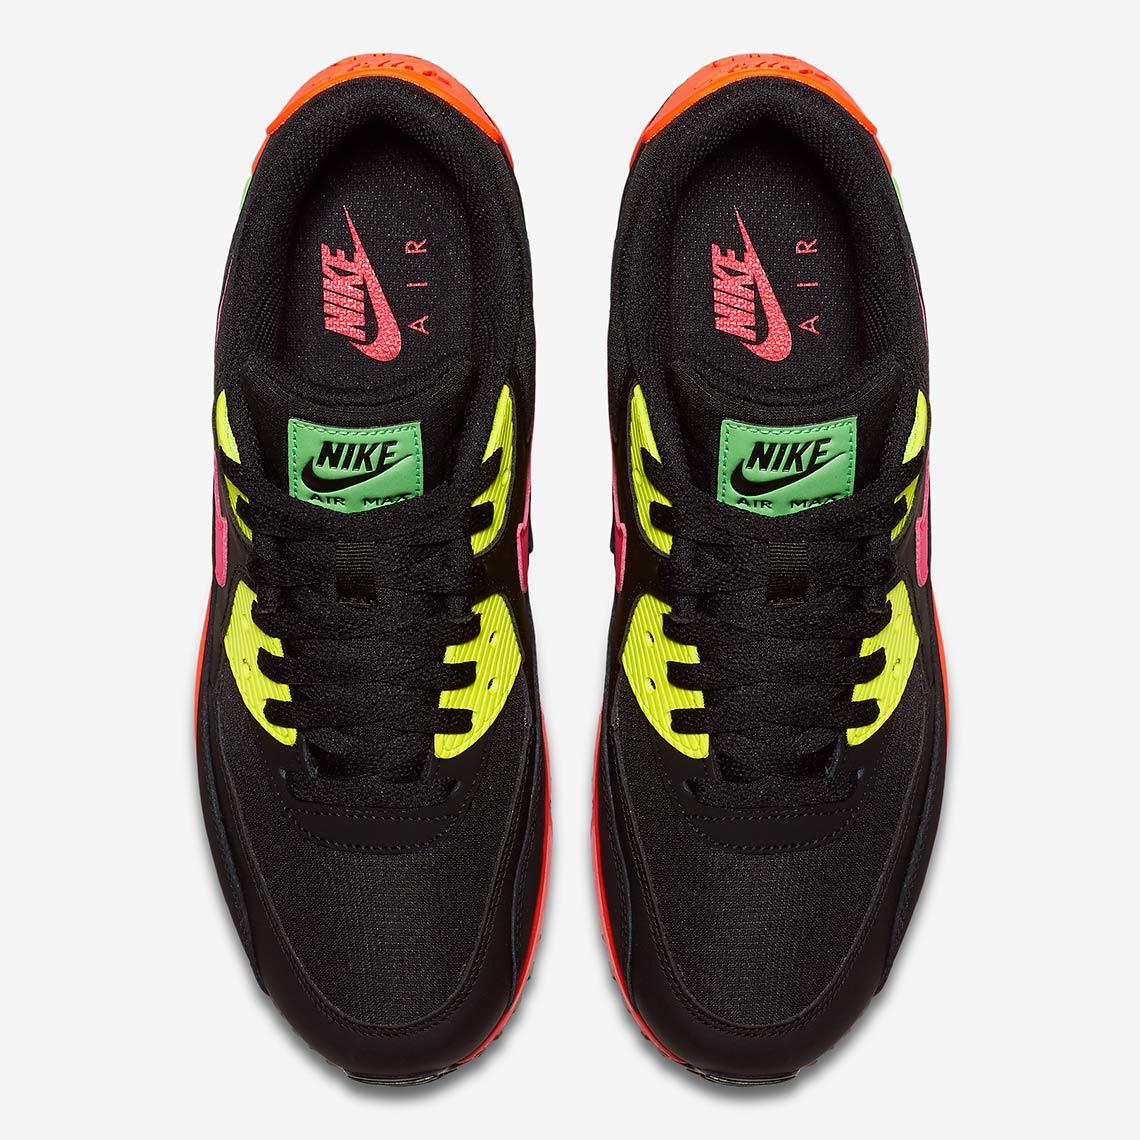 Nike Air Max 90 Tokyo Neon CI2290 064 Release Info